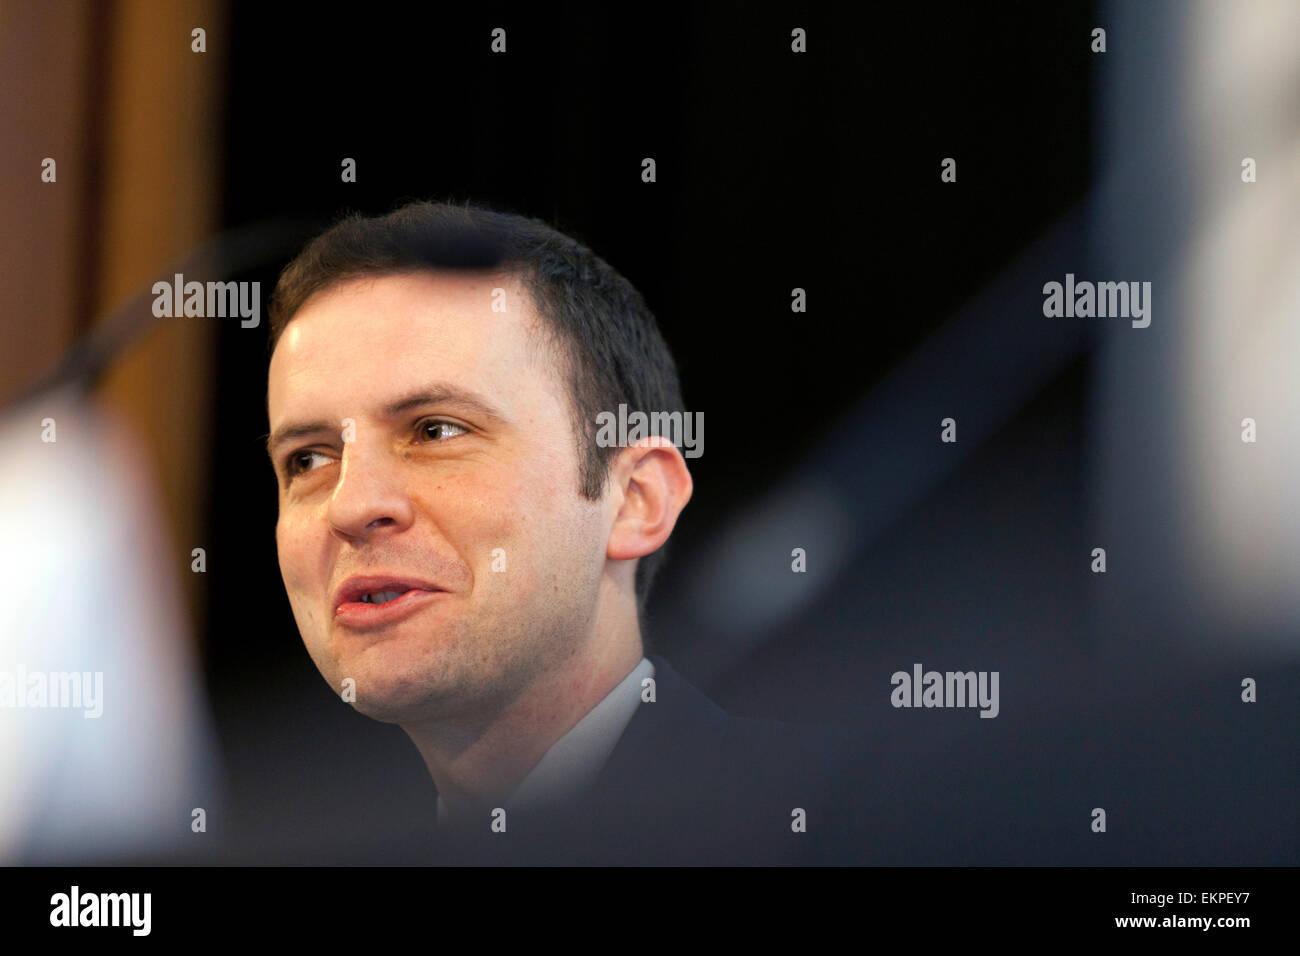 Economy Debate at The National Gallery, Edinburgh Stephen Gethins (SNP) - Stock Image